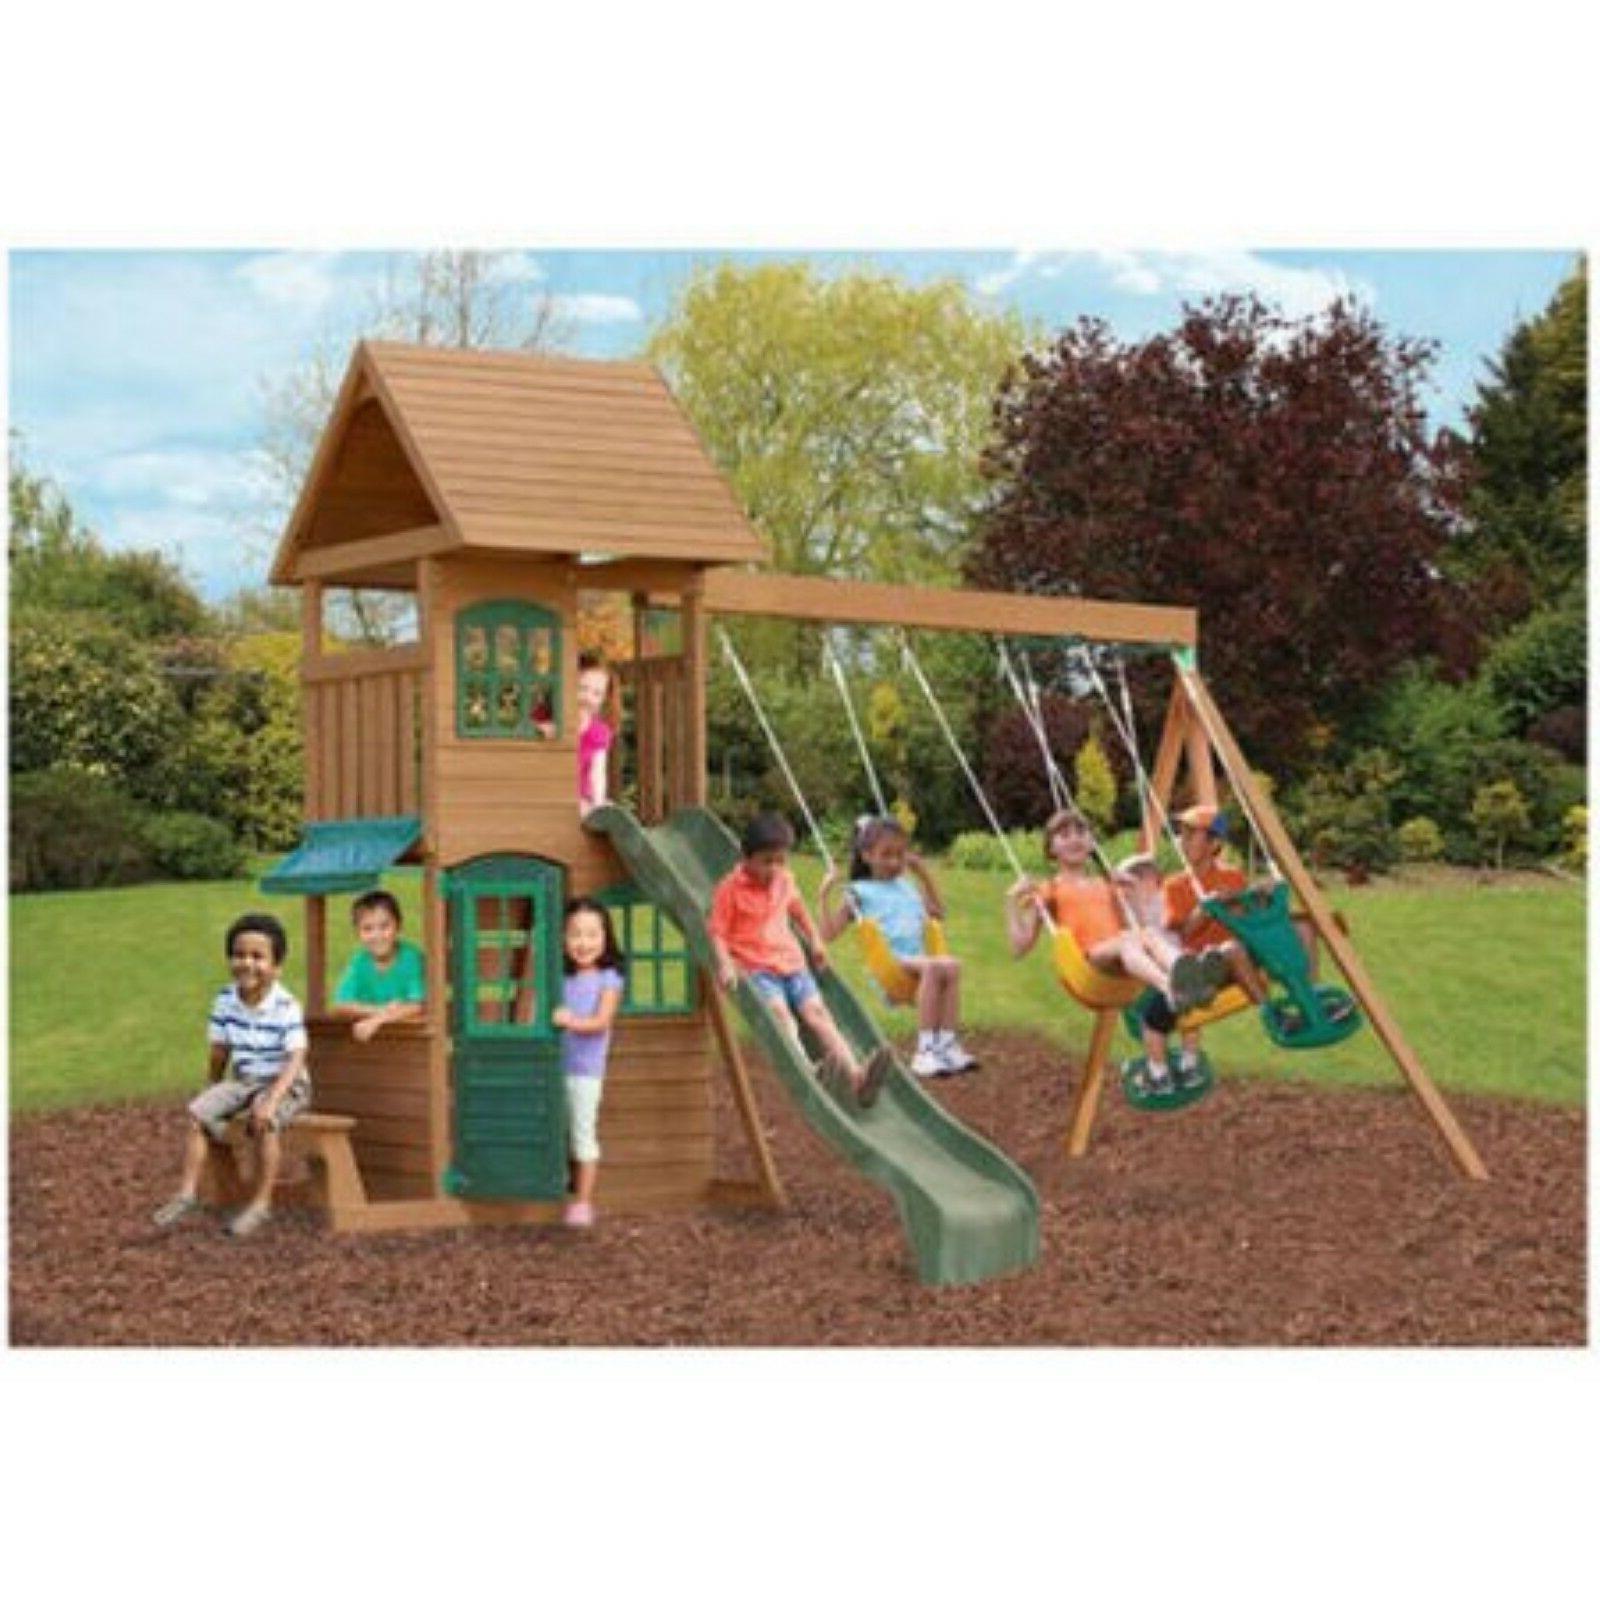 wooden cedar swing play set outdoor backyard